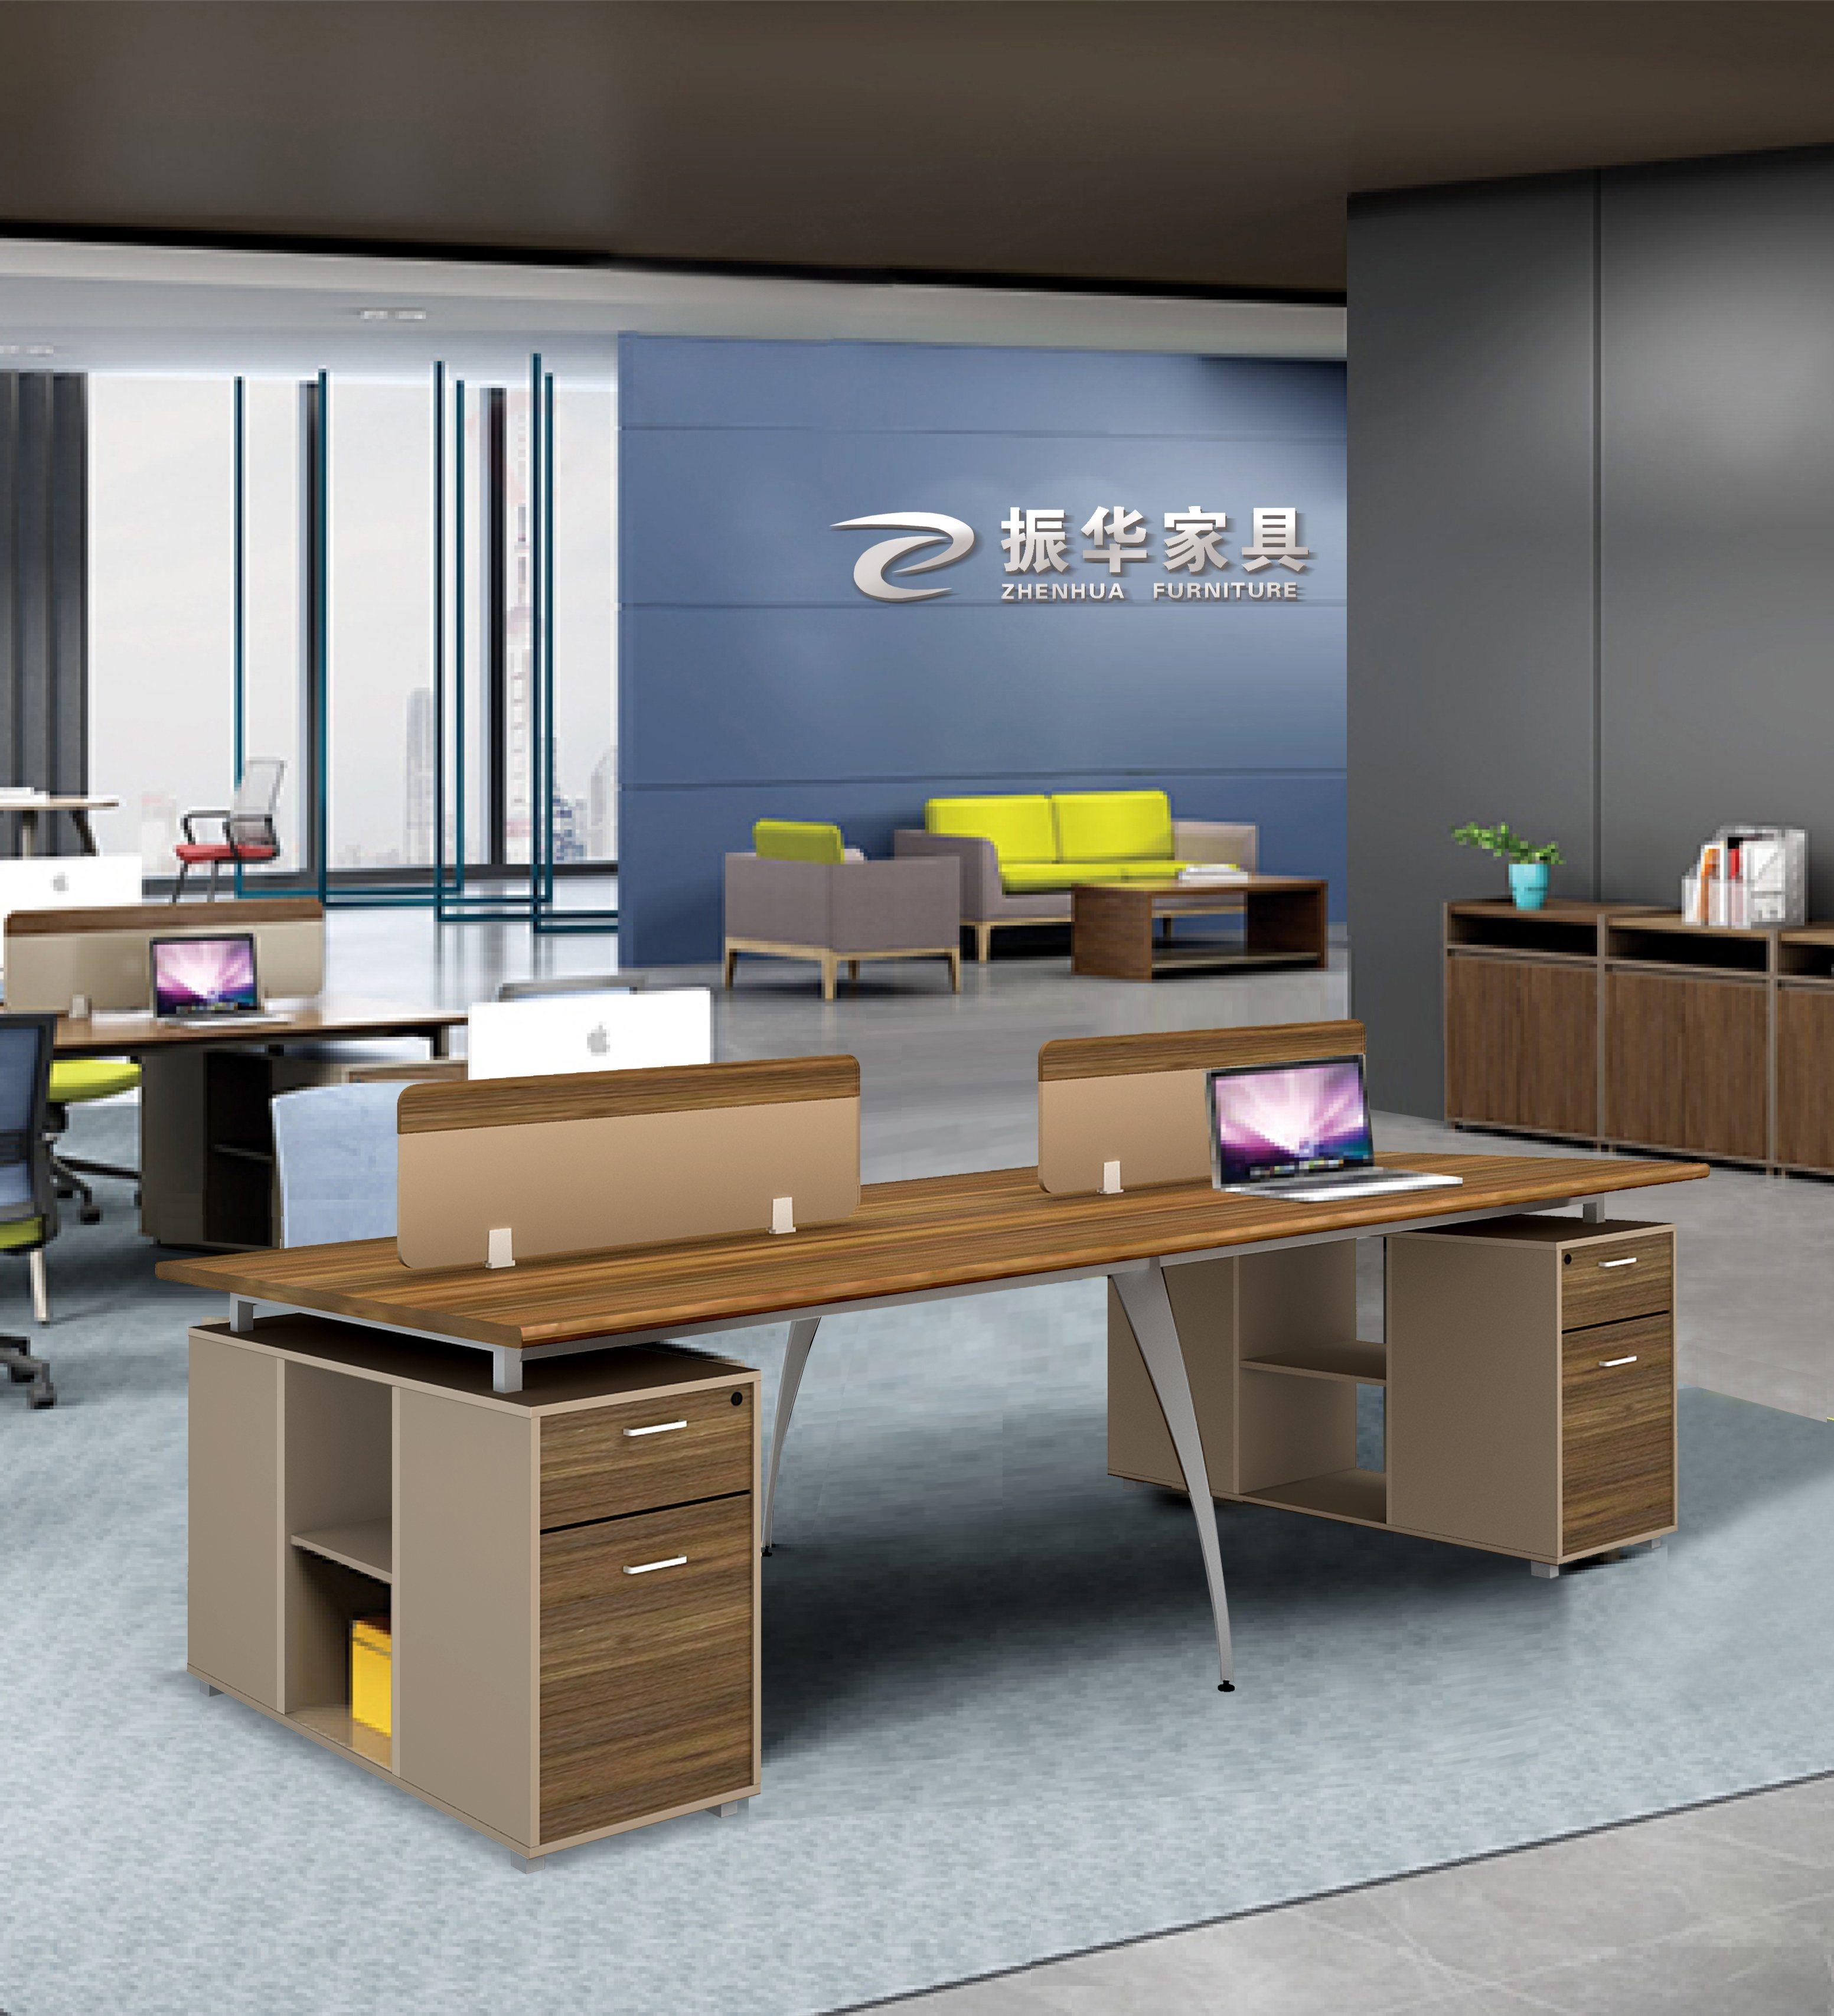 China Office Furniture Modern Wooden Design Workstation Office Desk Table Workstation China Office Workstation Cubicle